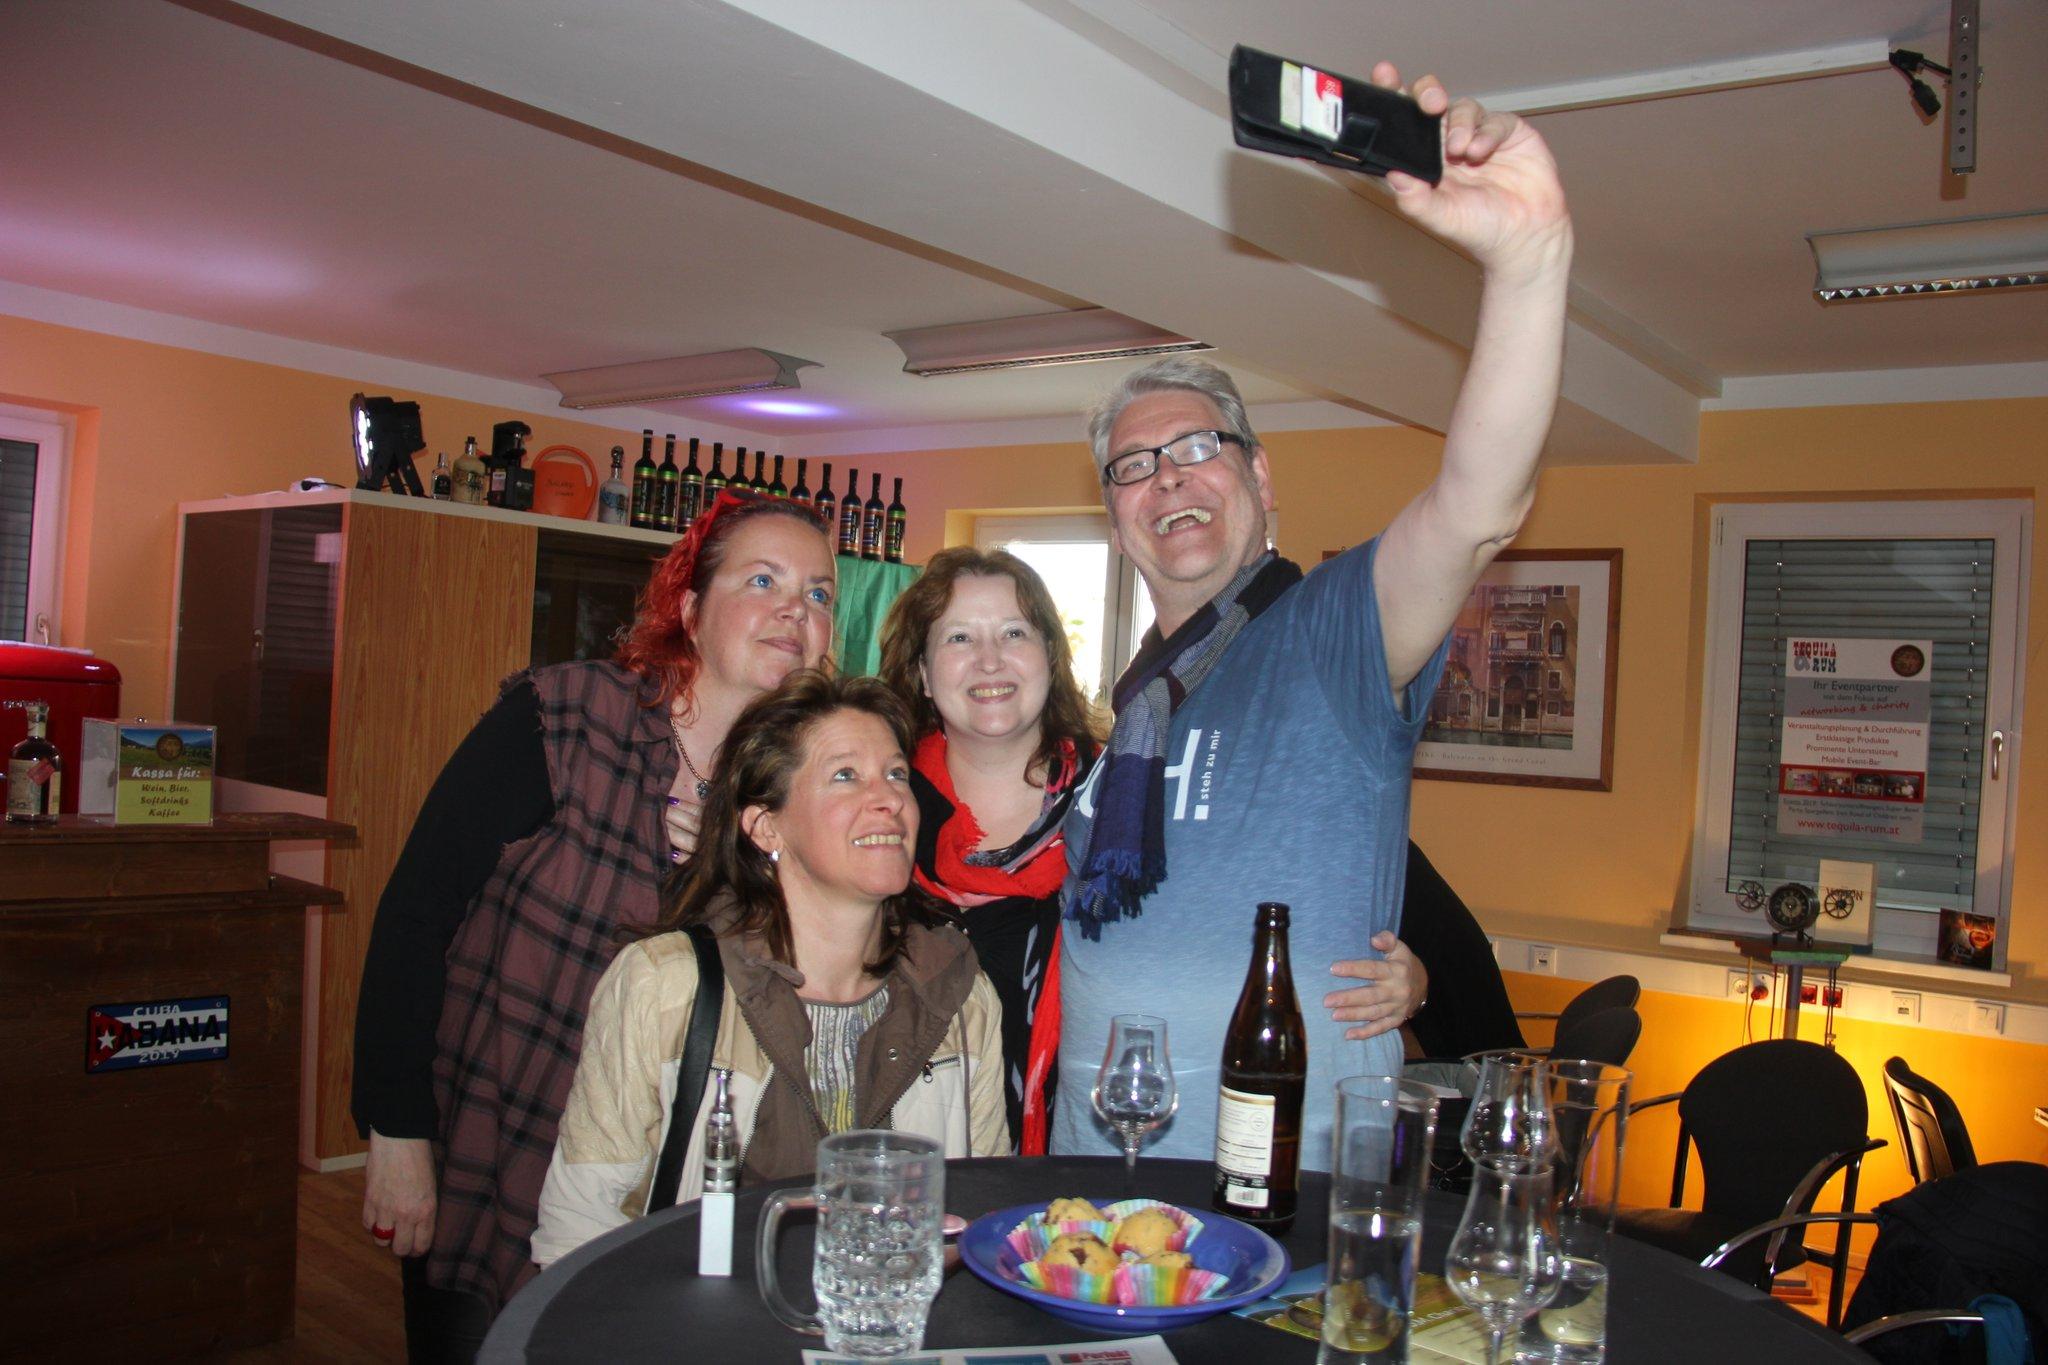 Bekanntschaften in Innsbruck - Partnersuche & Kontakte